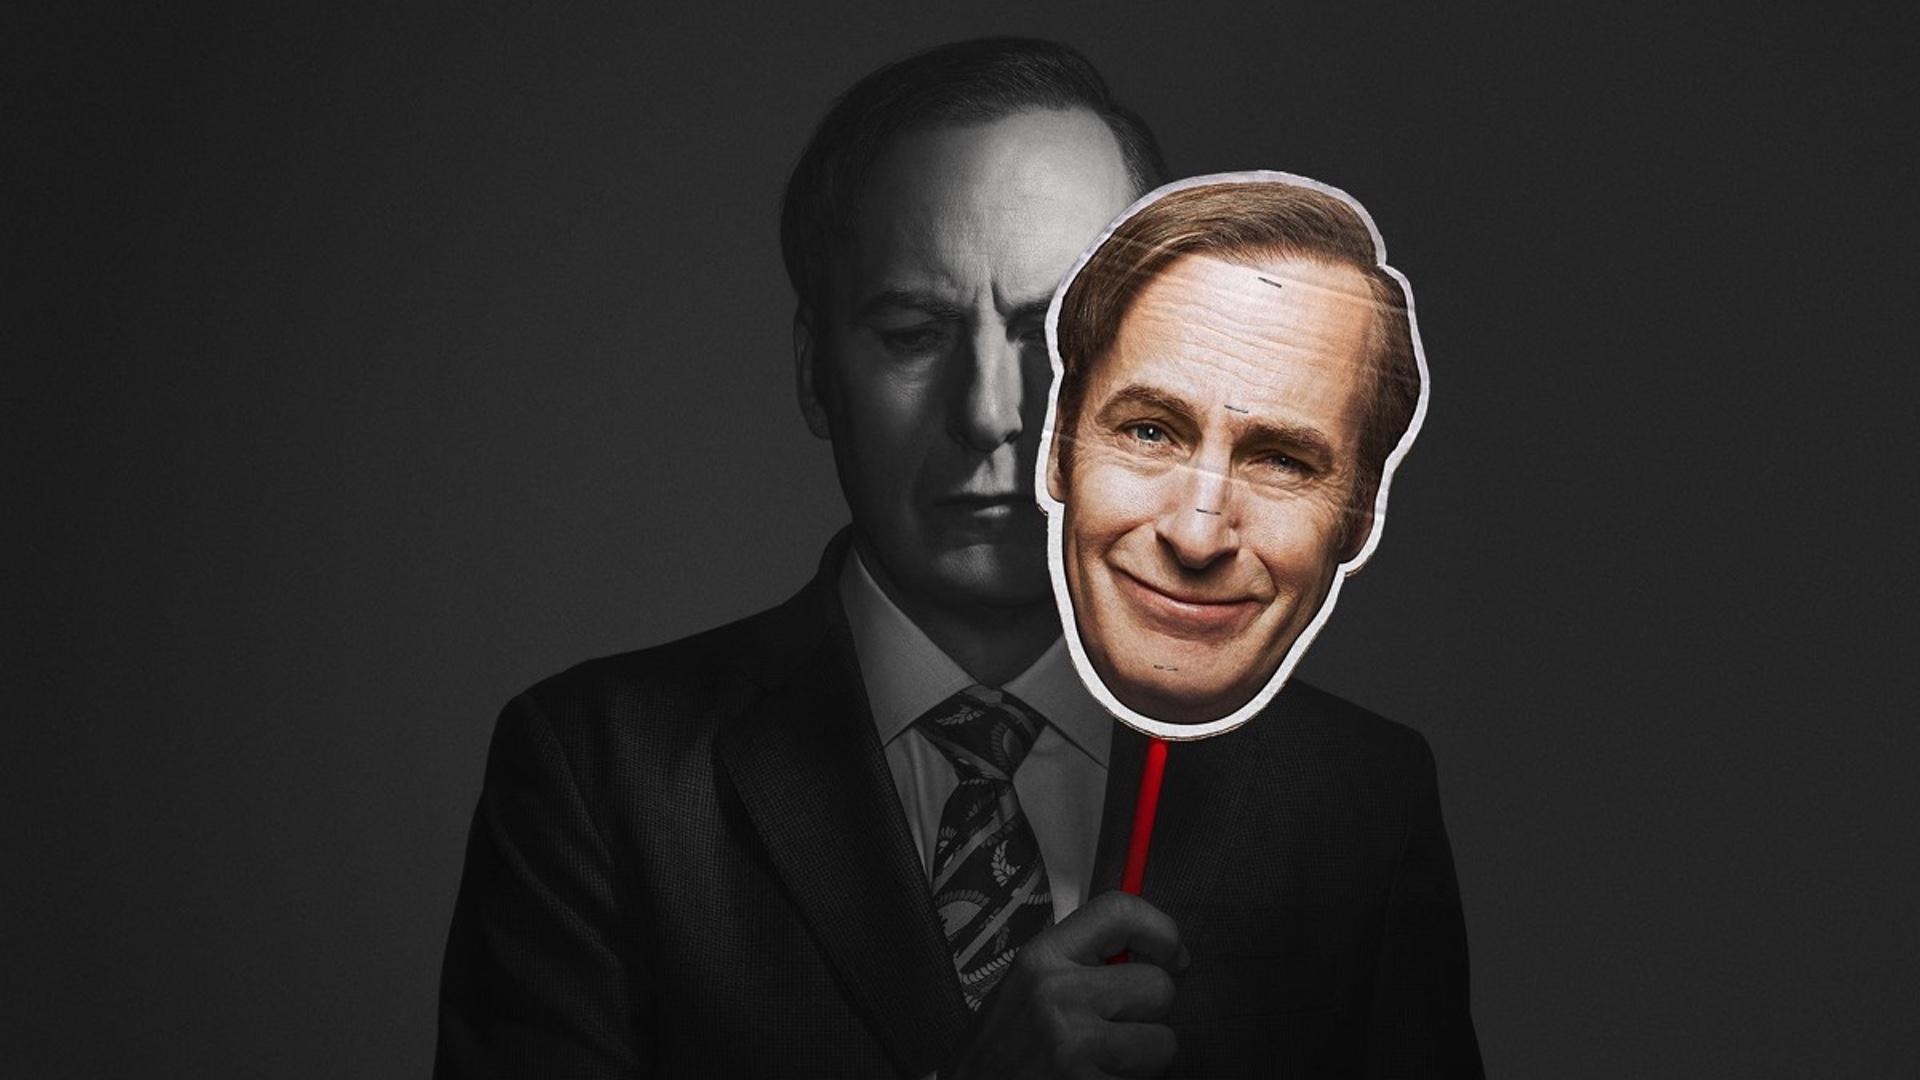 Bob Odenkirk Says BETTER CALL SAUL Season 5 is